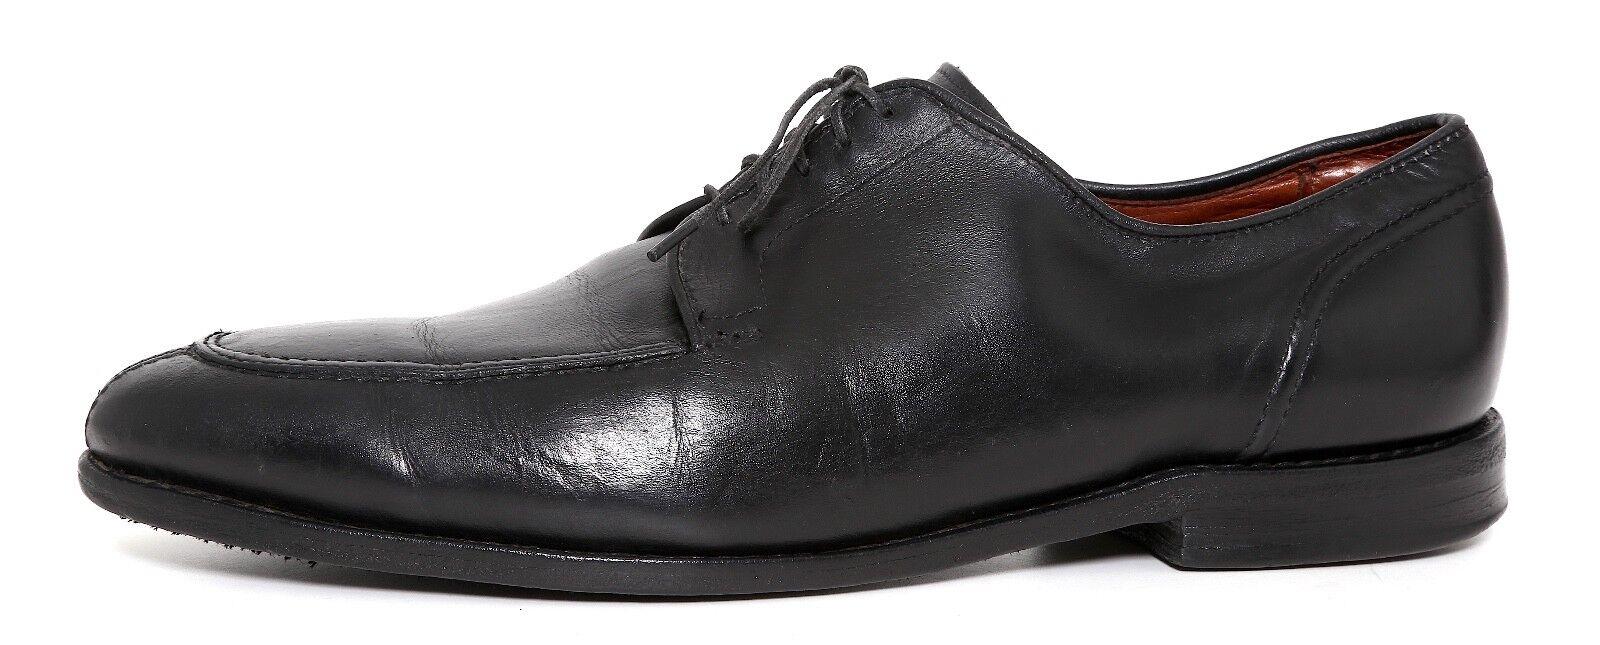 Allen Edmonds LaSalle Split Toe Leather bluecher Black Men Sz 10.5 D 4159